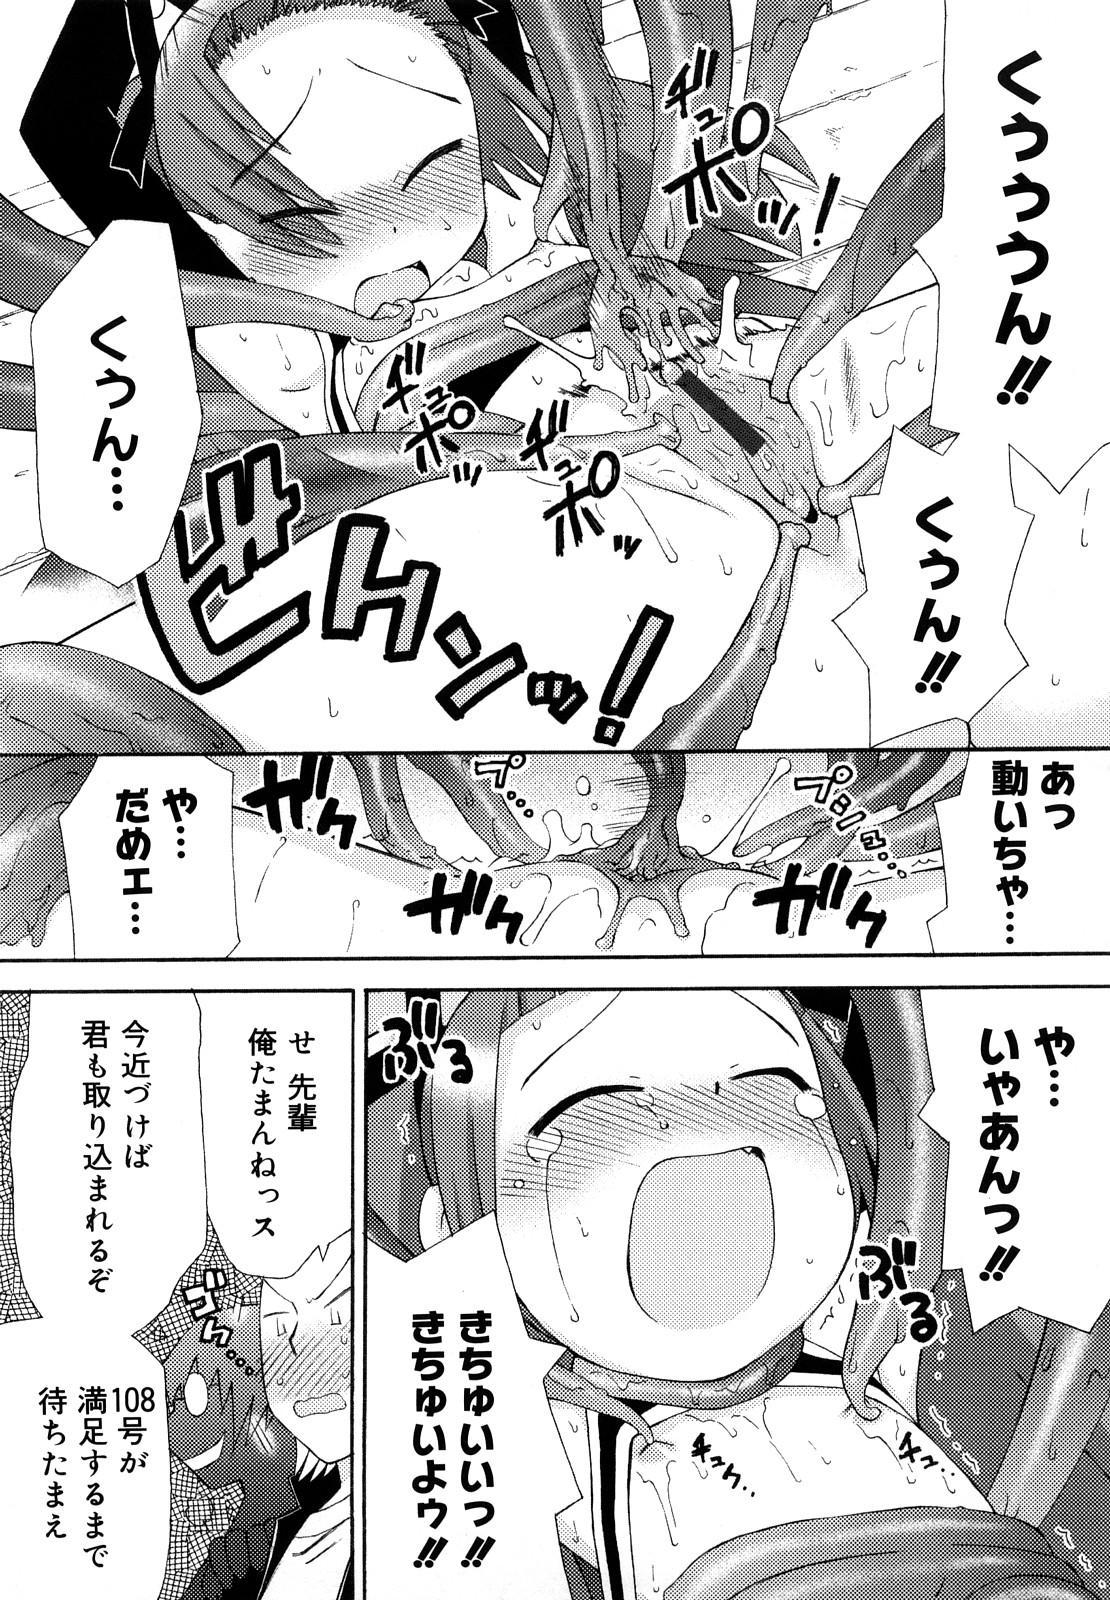 Hatsuden Pandakun! Shinsouban 123